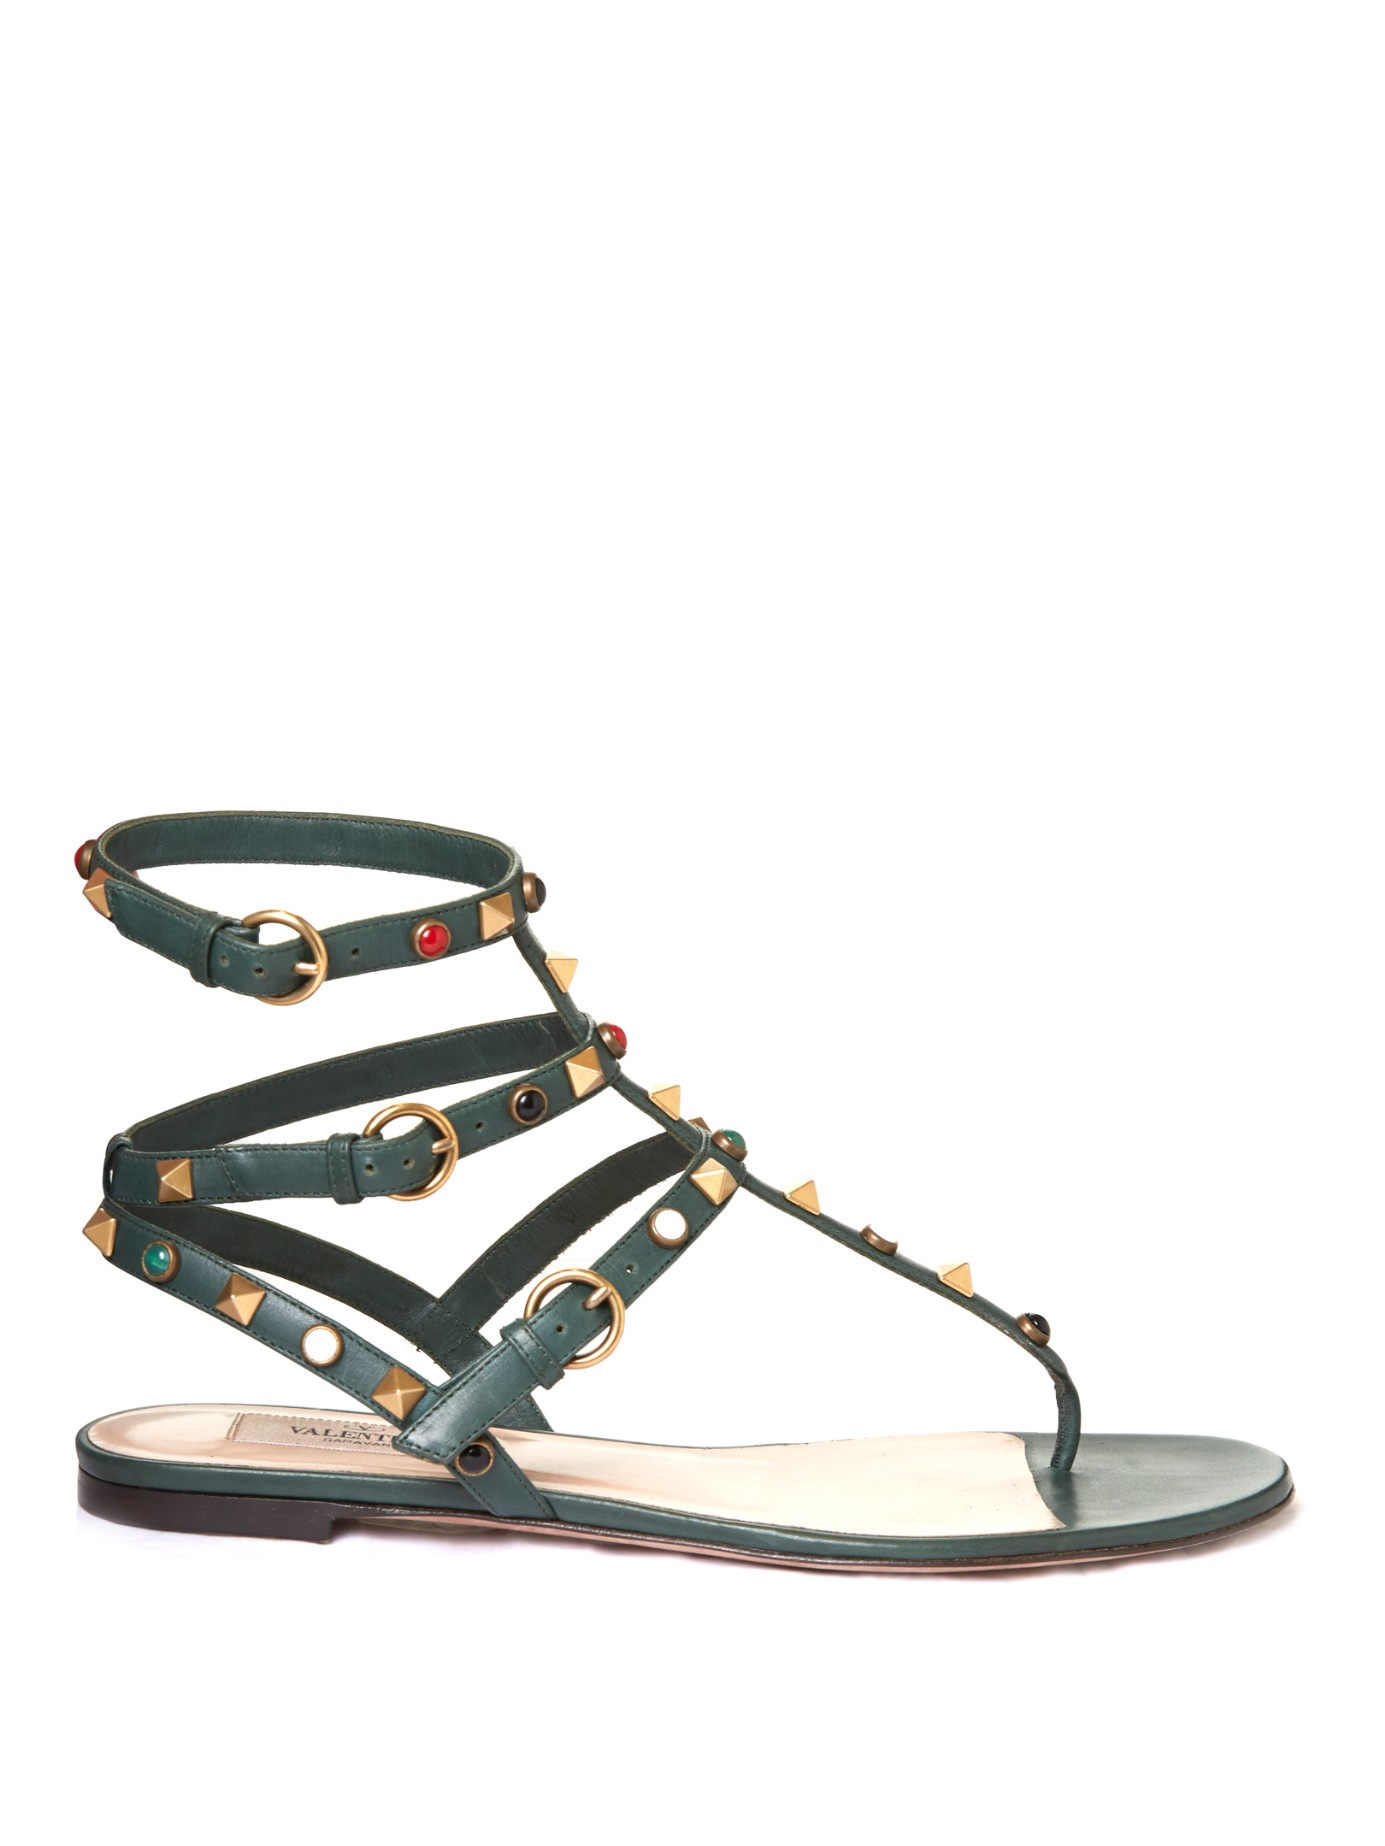 de2d7d0ed Lyst - Valentino Rockstud Rolling Leather Flat Sandals in Green